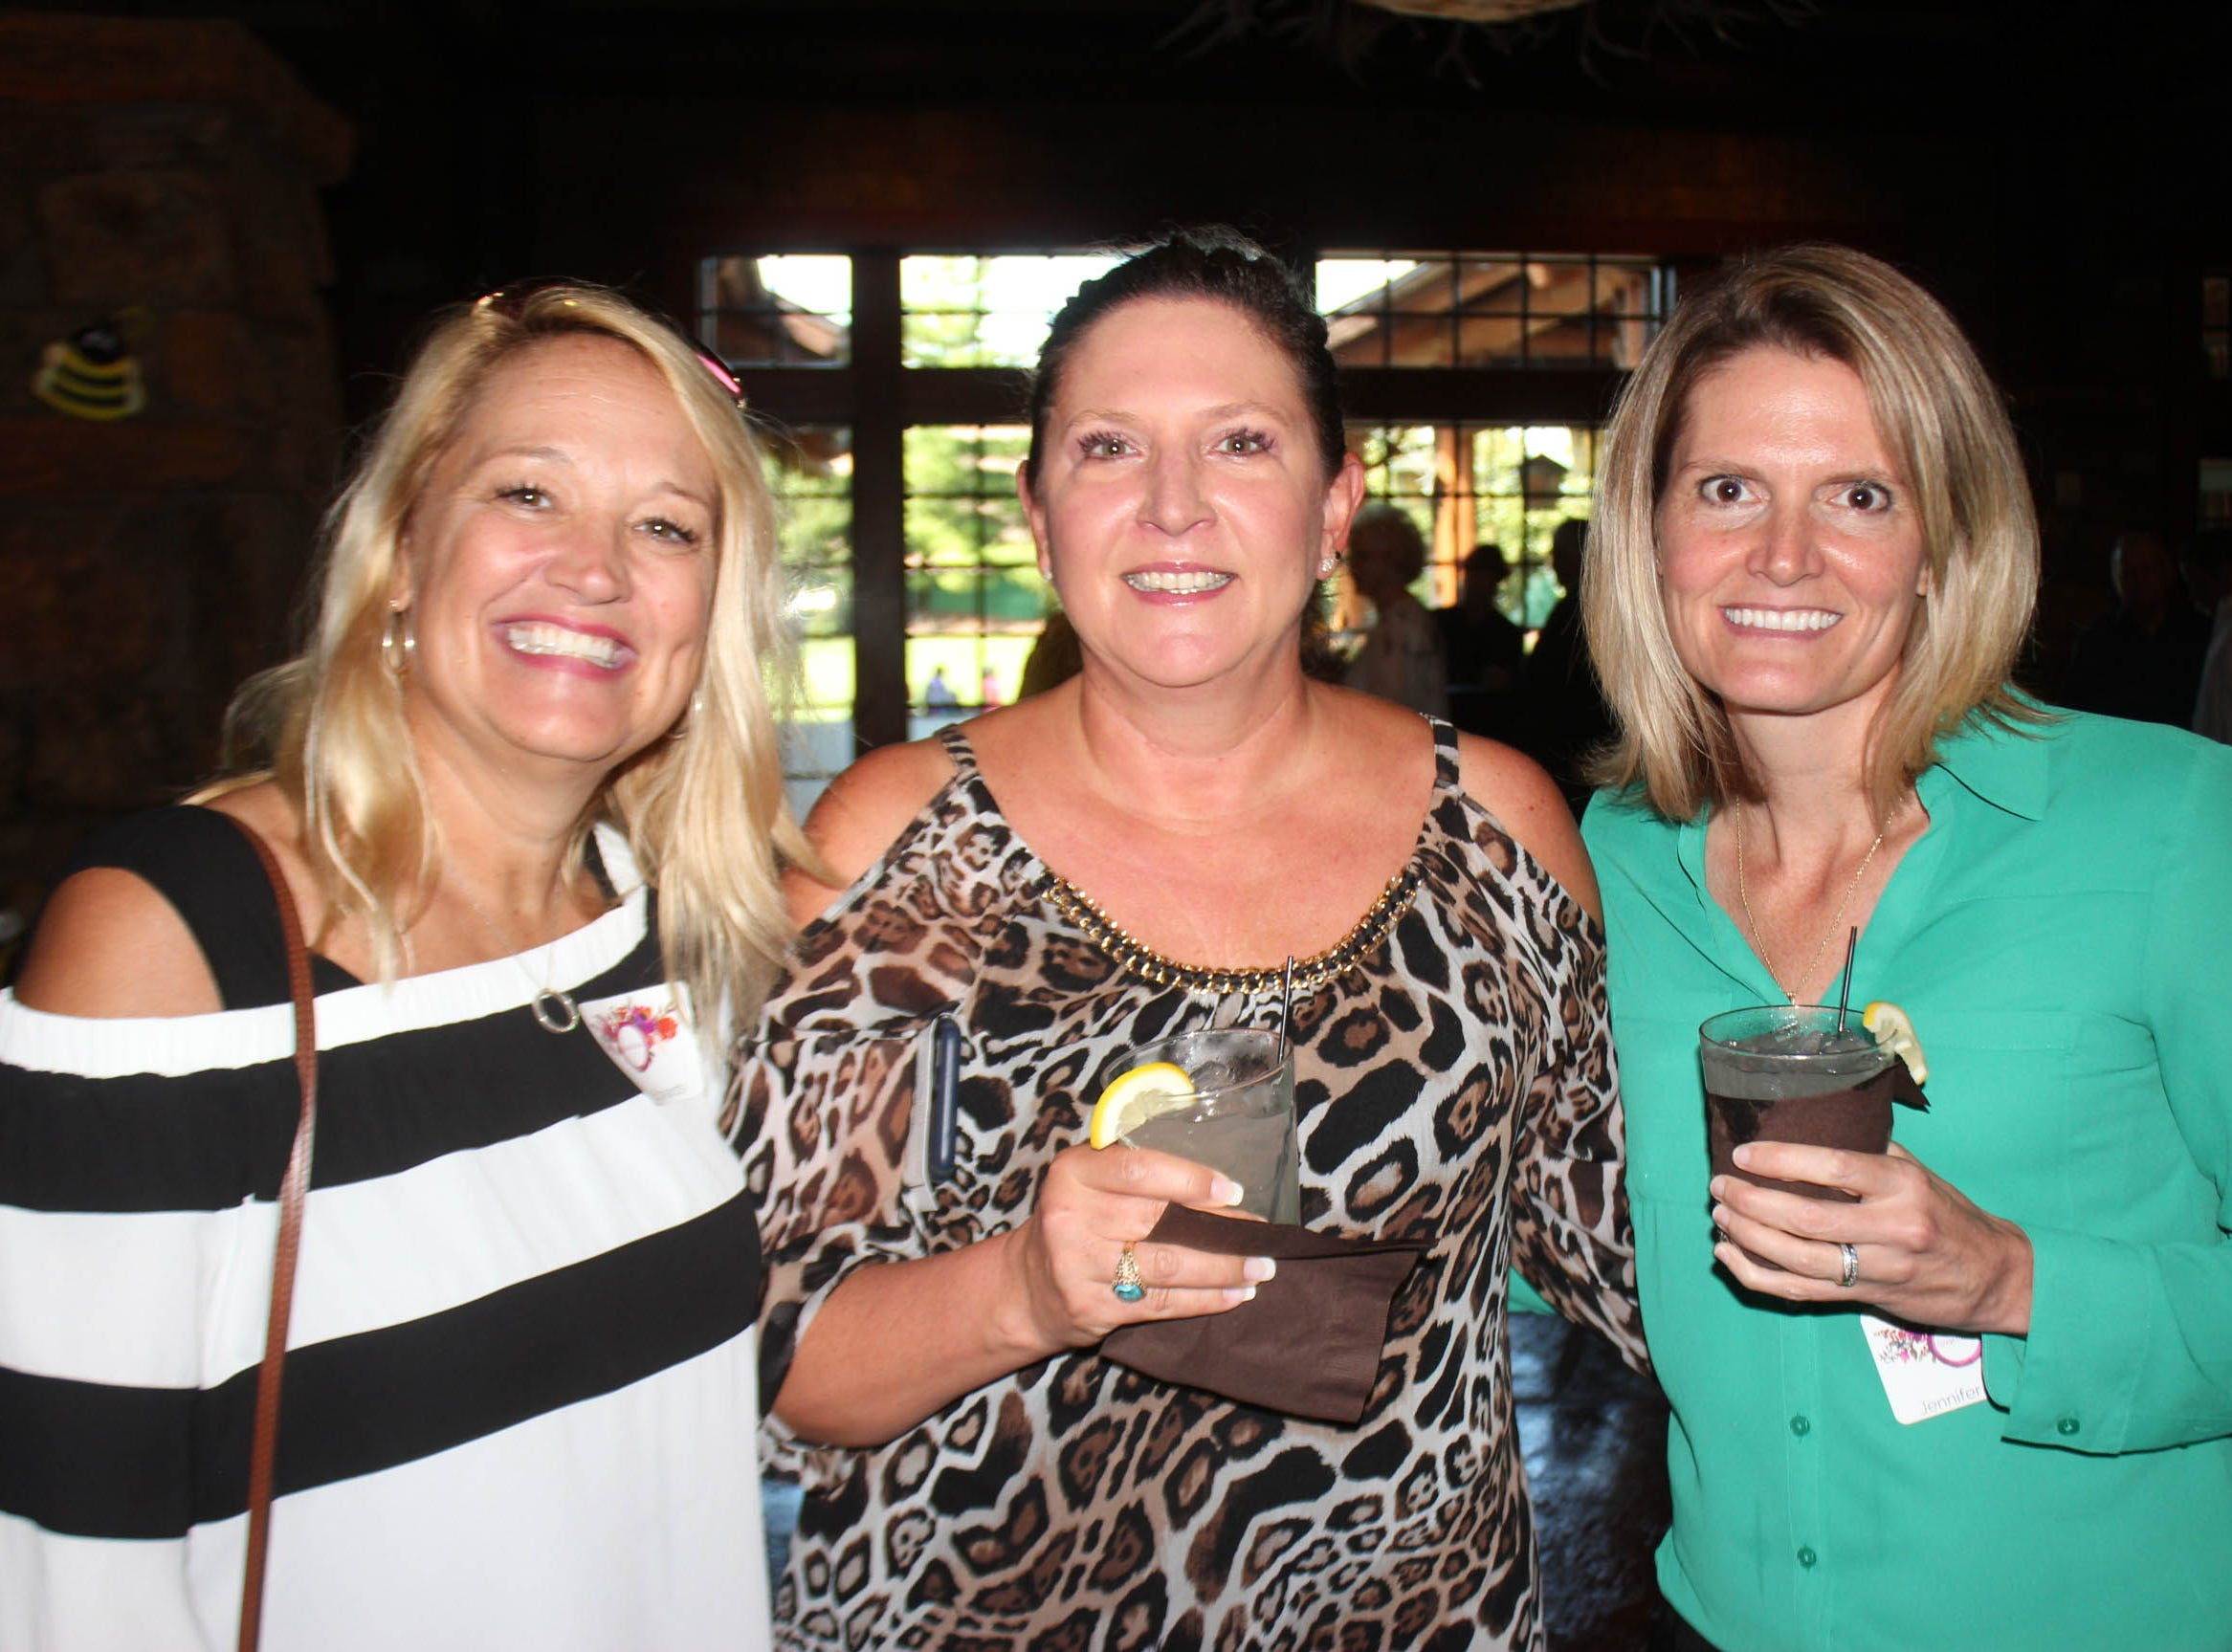 Jeanna Edwards, Beth Gibson, and Jennifer Danko